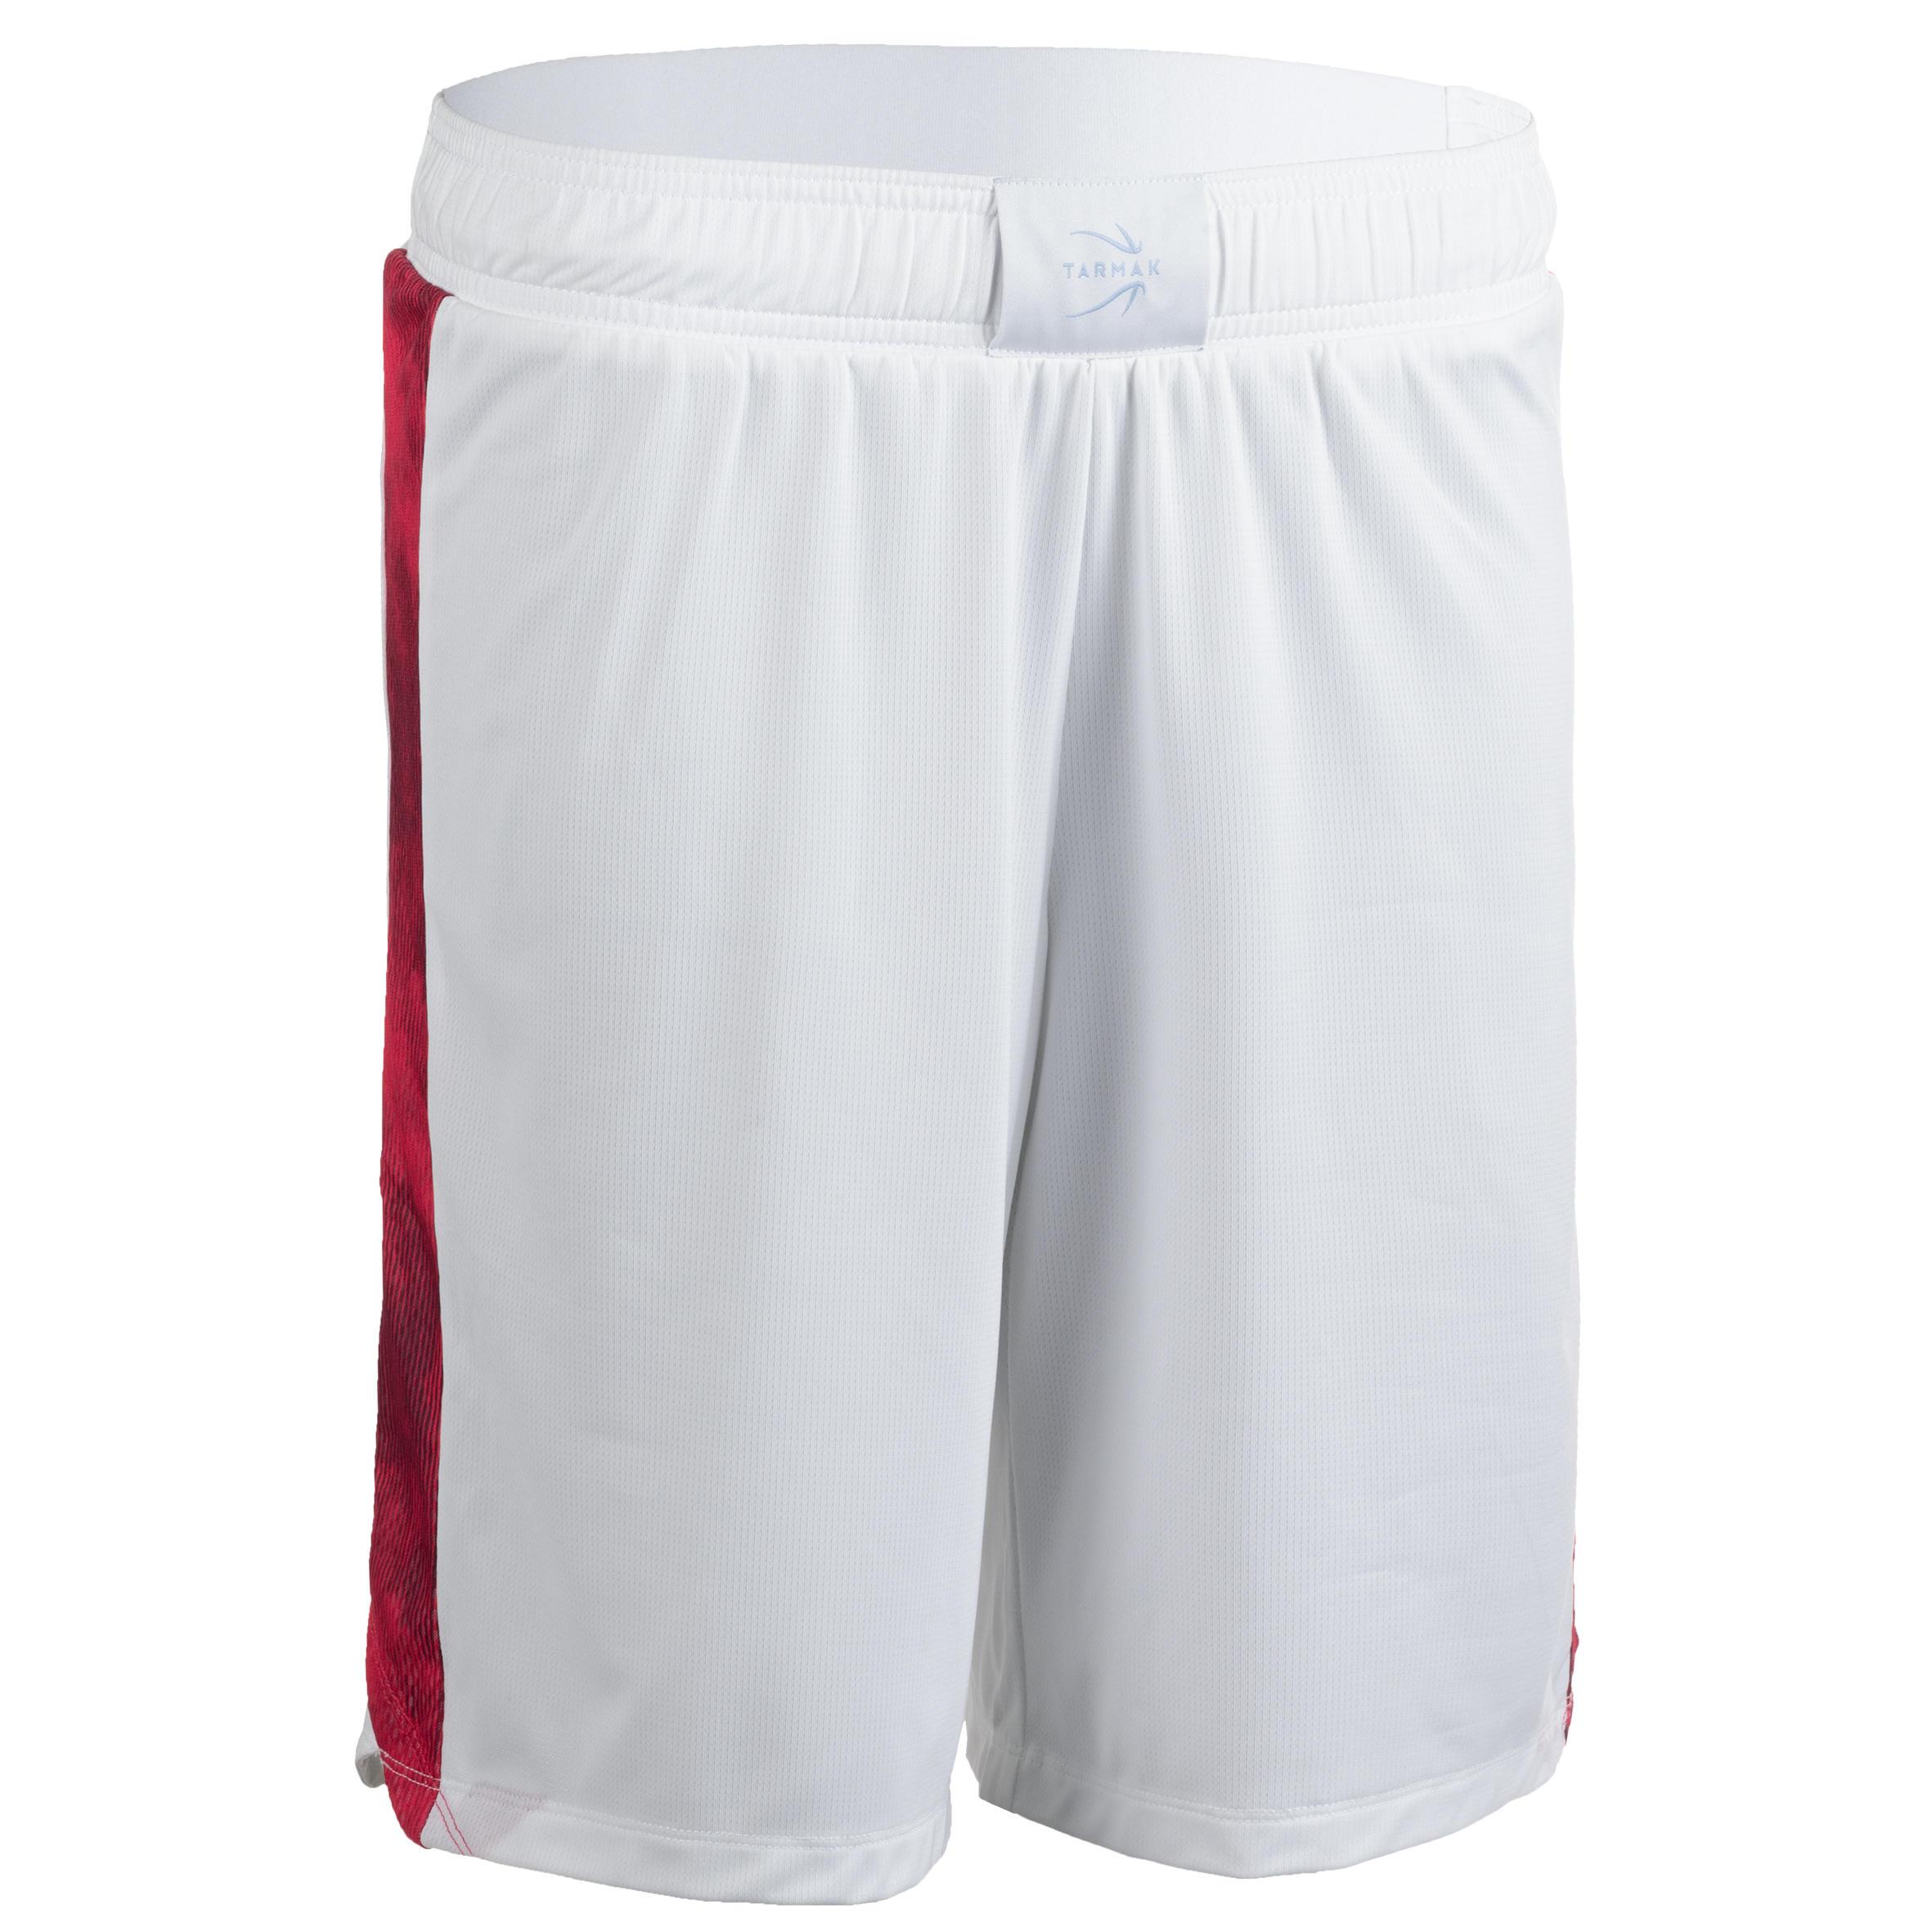 Basketballshorts SH500 Damen weiß/rosa | Sportbekleidung > Sporthosen > Basketballshorts | Weiß - Rot - Rosa | Tarmak